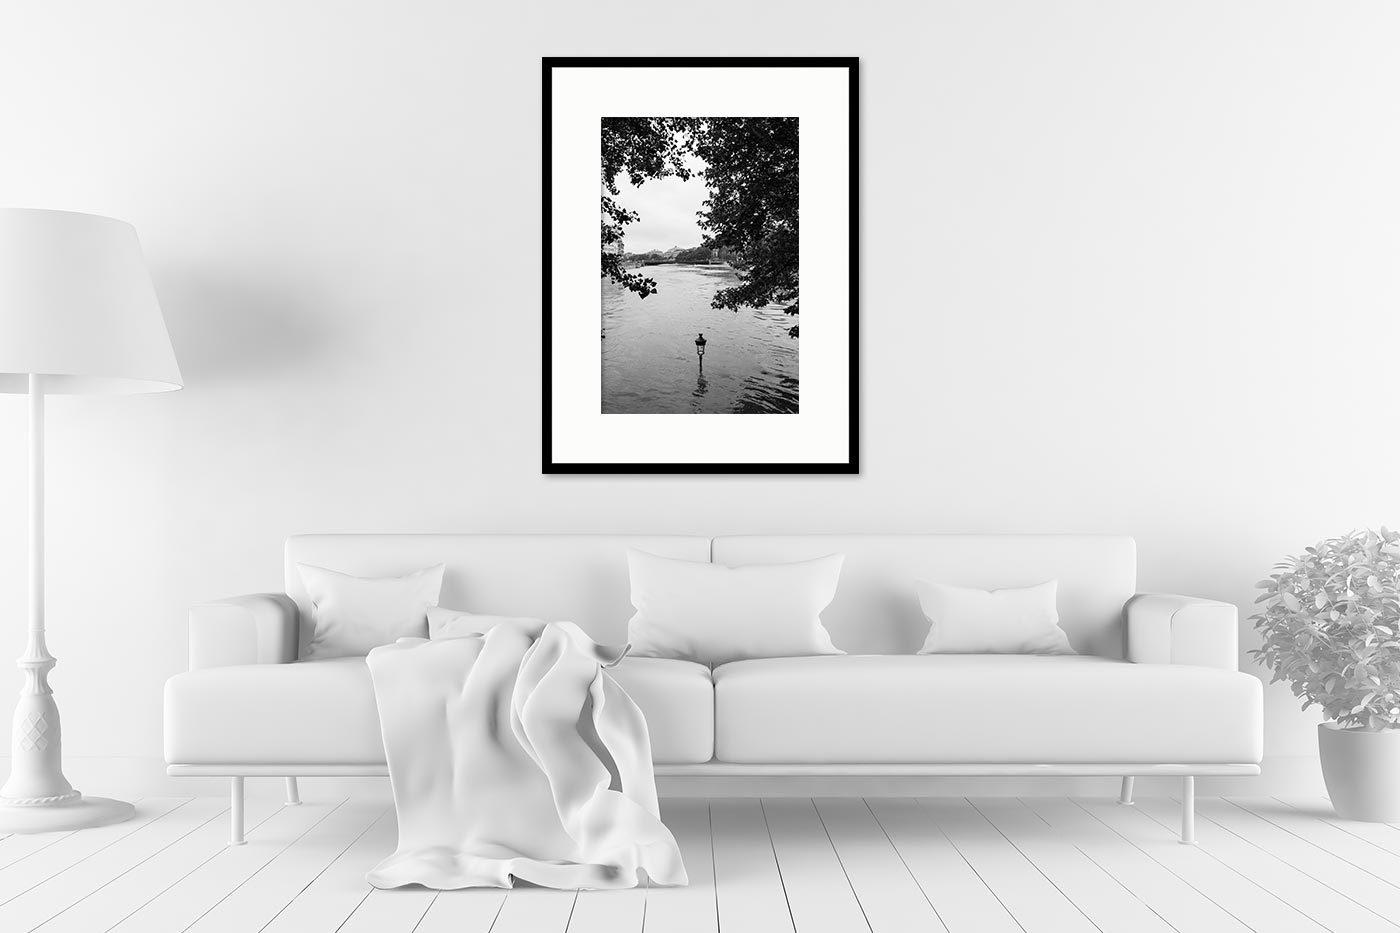 Cadre galerie 60x80 Flooded Paris